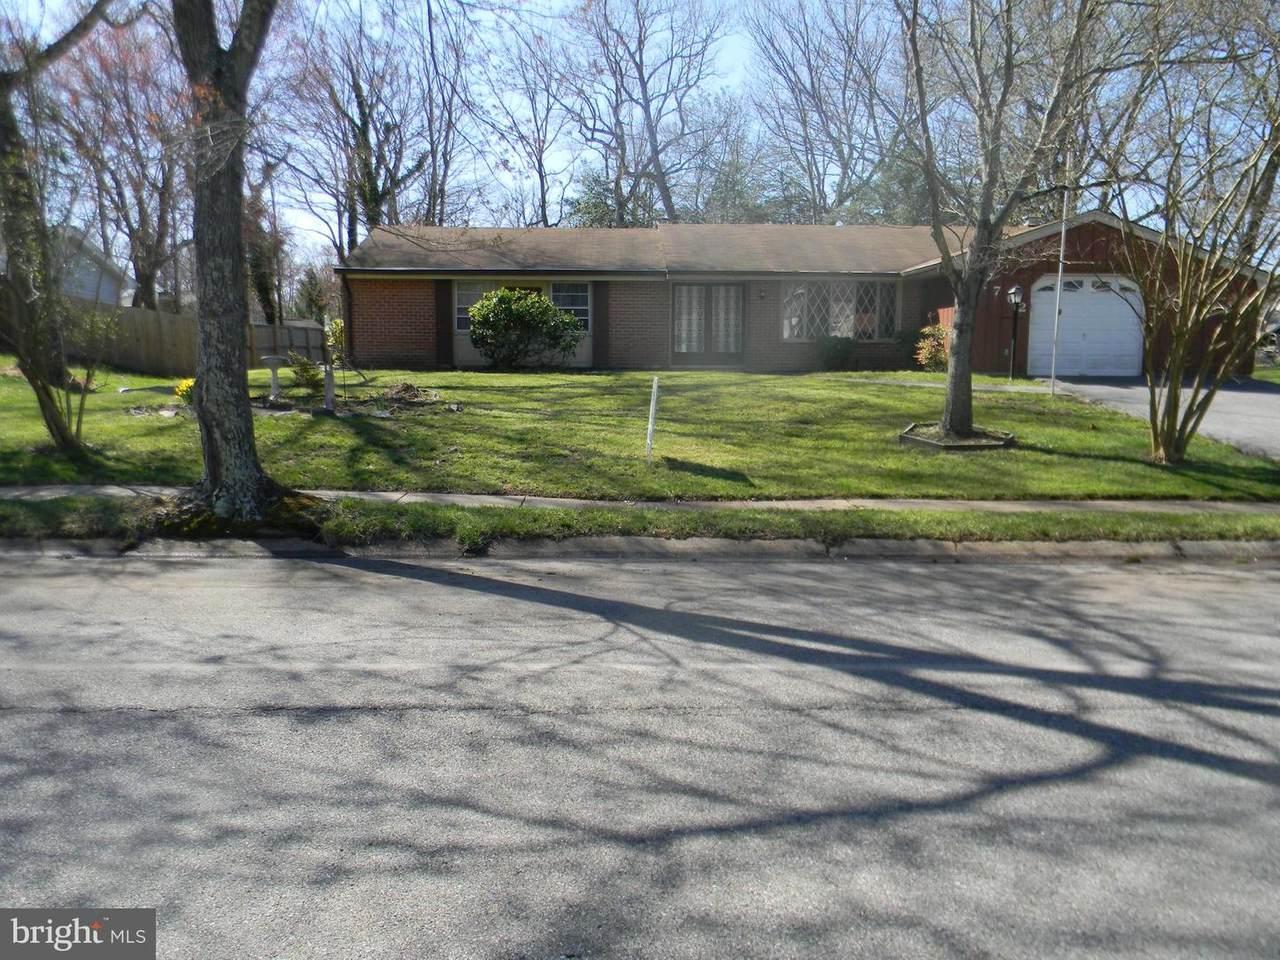 2762 Pinewood Drive - Photo 1